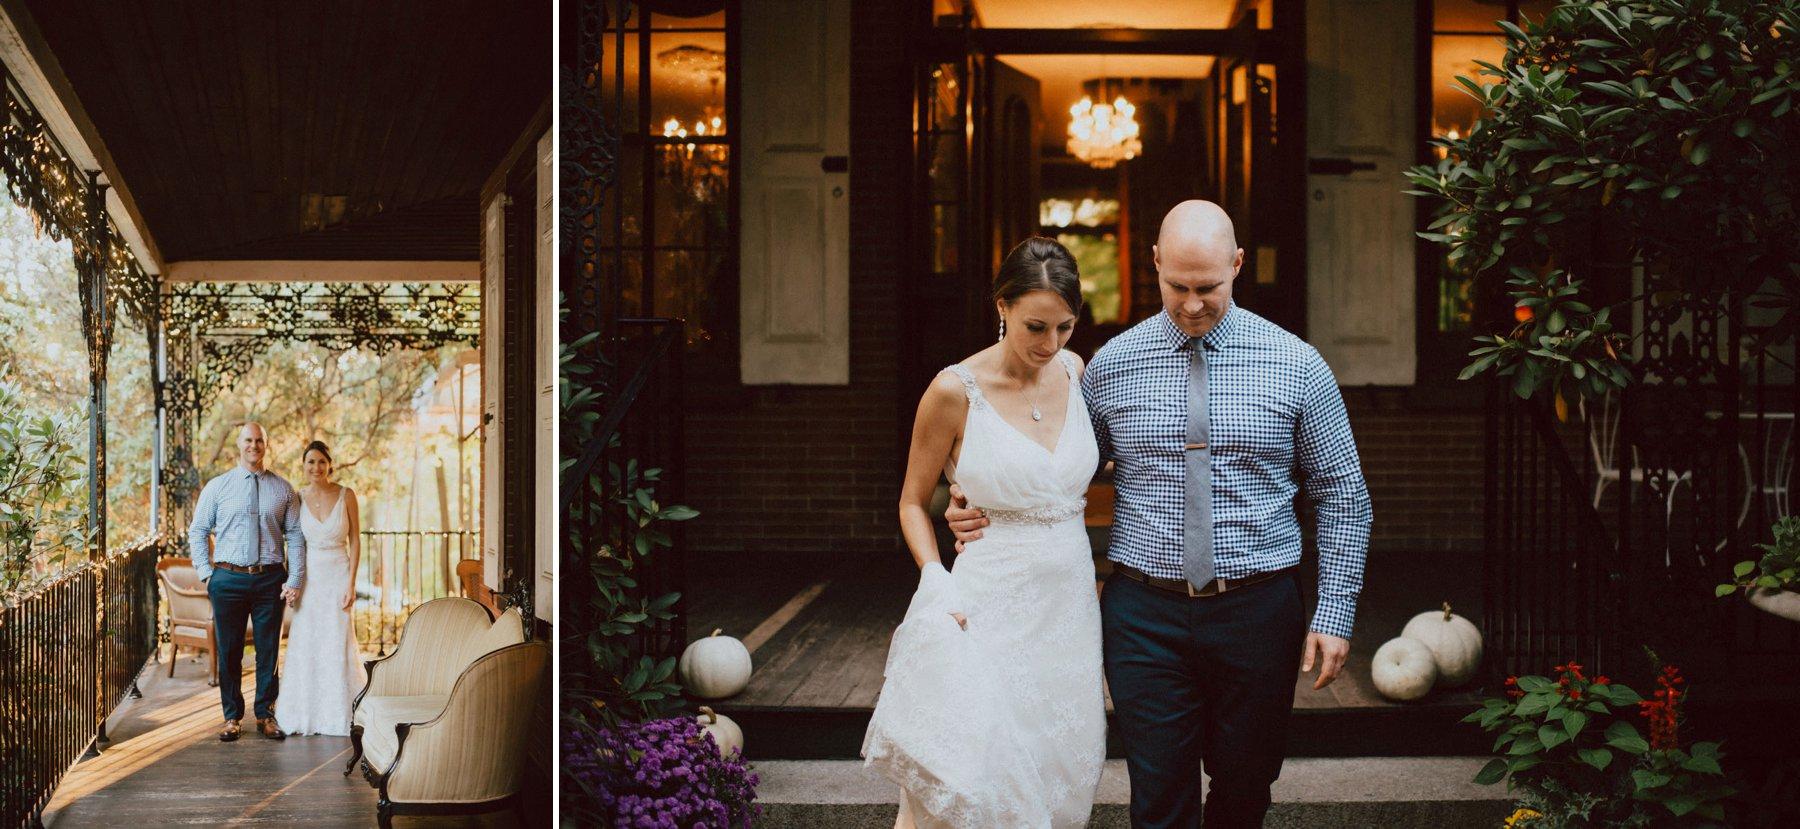 faunbrook-bed-and-breakfast-wedding-107.jpg